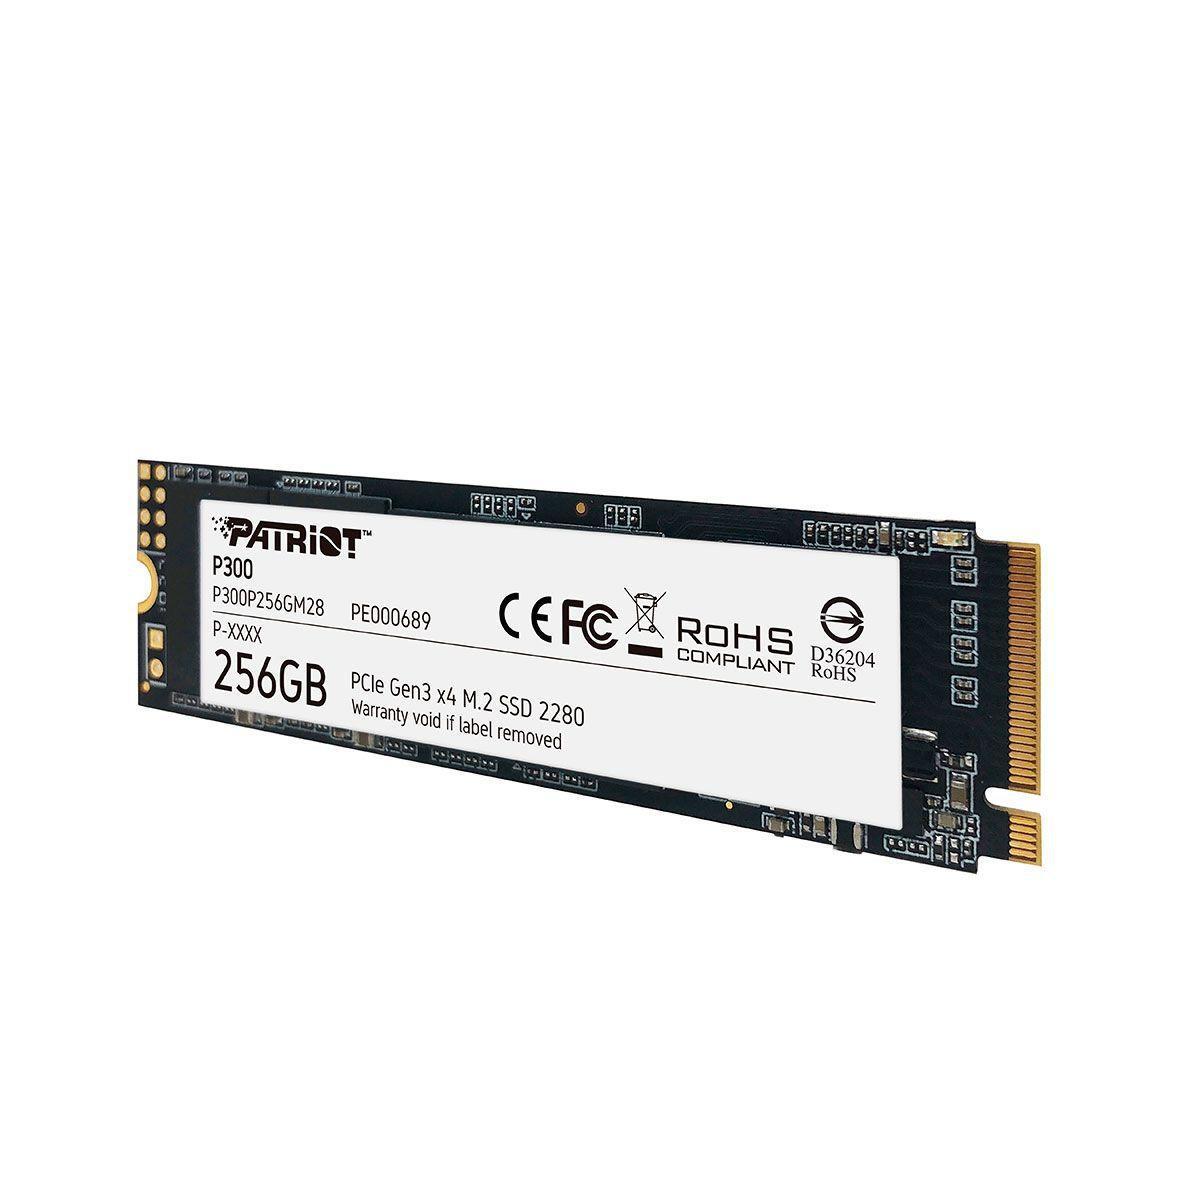 SSD Patriot P300 256GB, M.2 2280 PCIe Gen3X4, Leitura: 1700MB/s e Gravação: 1100MB/s - P300P256GM28